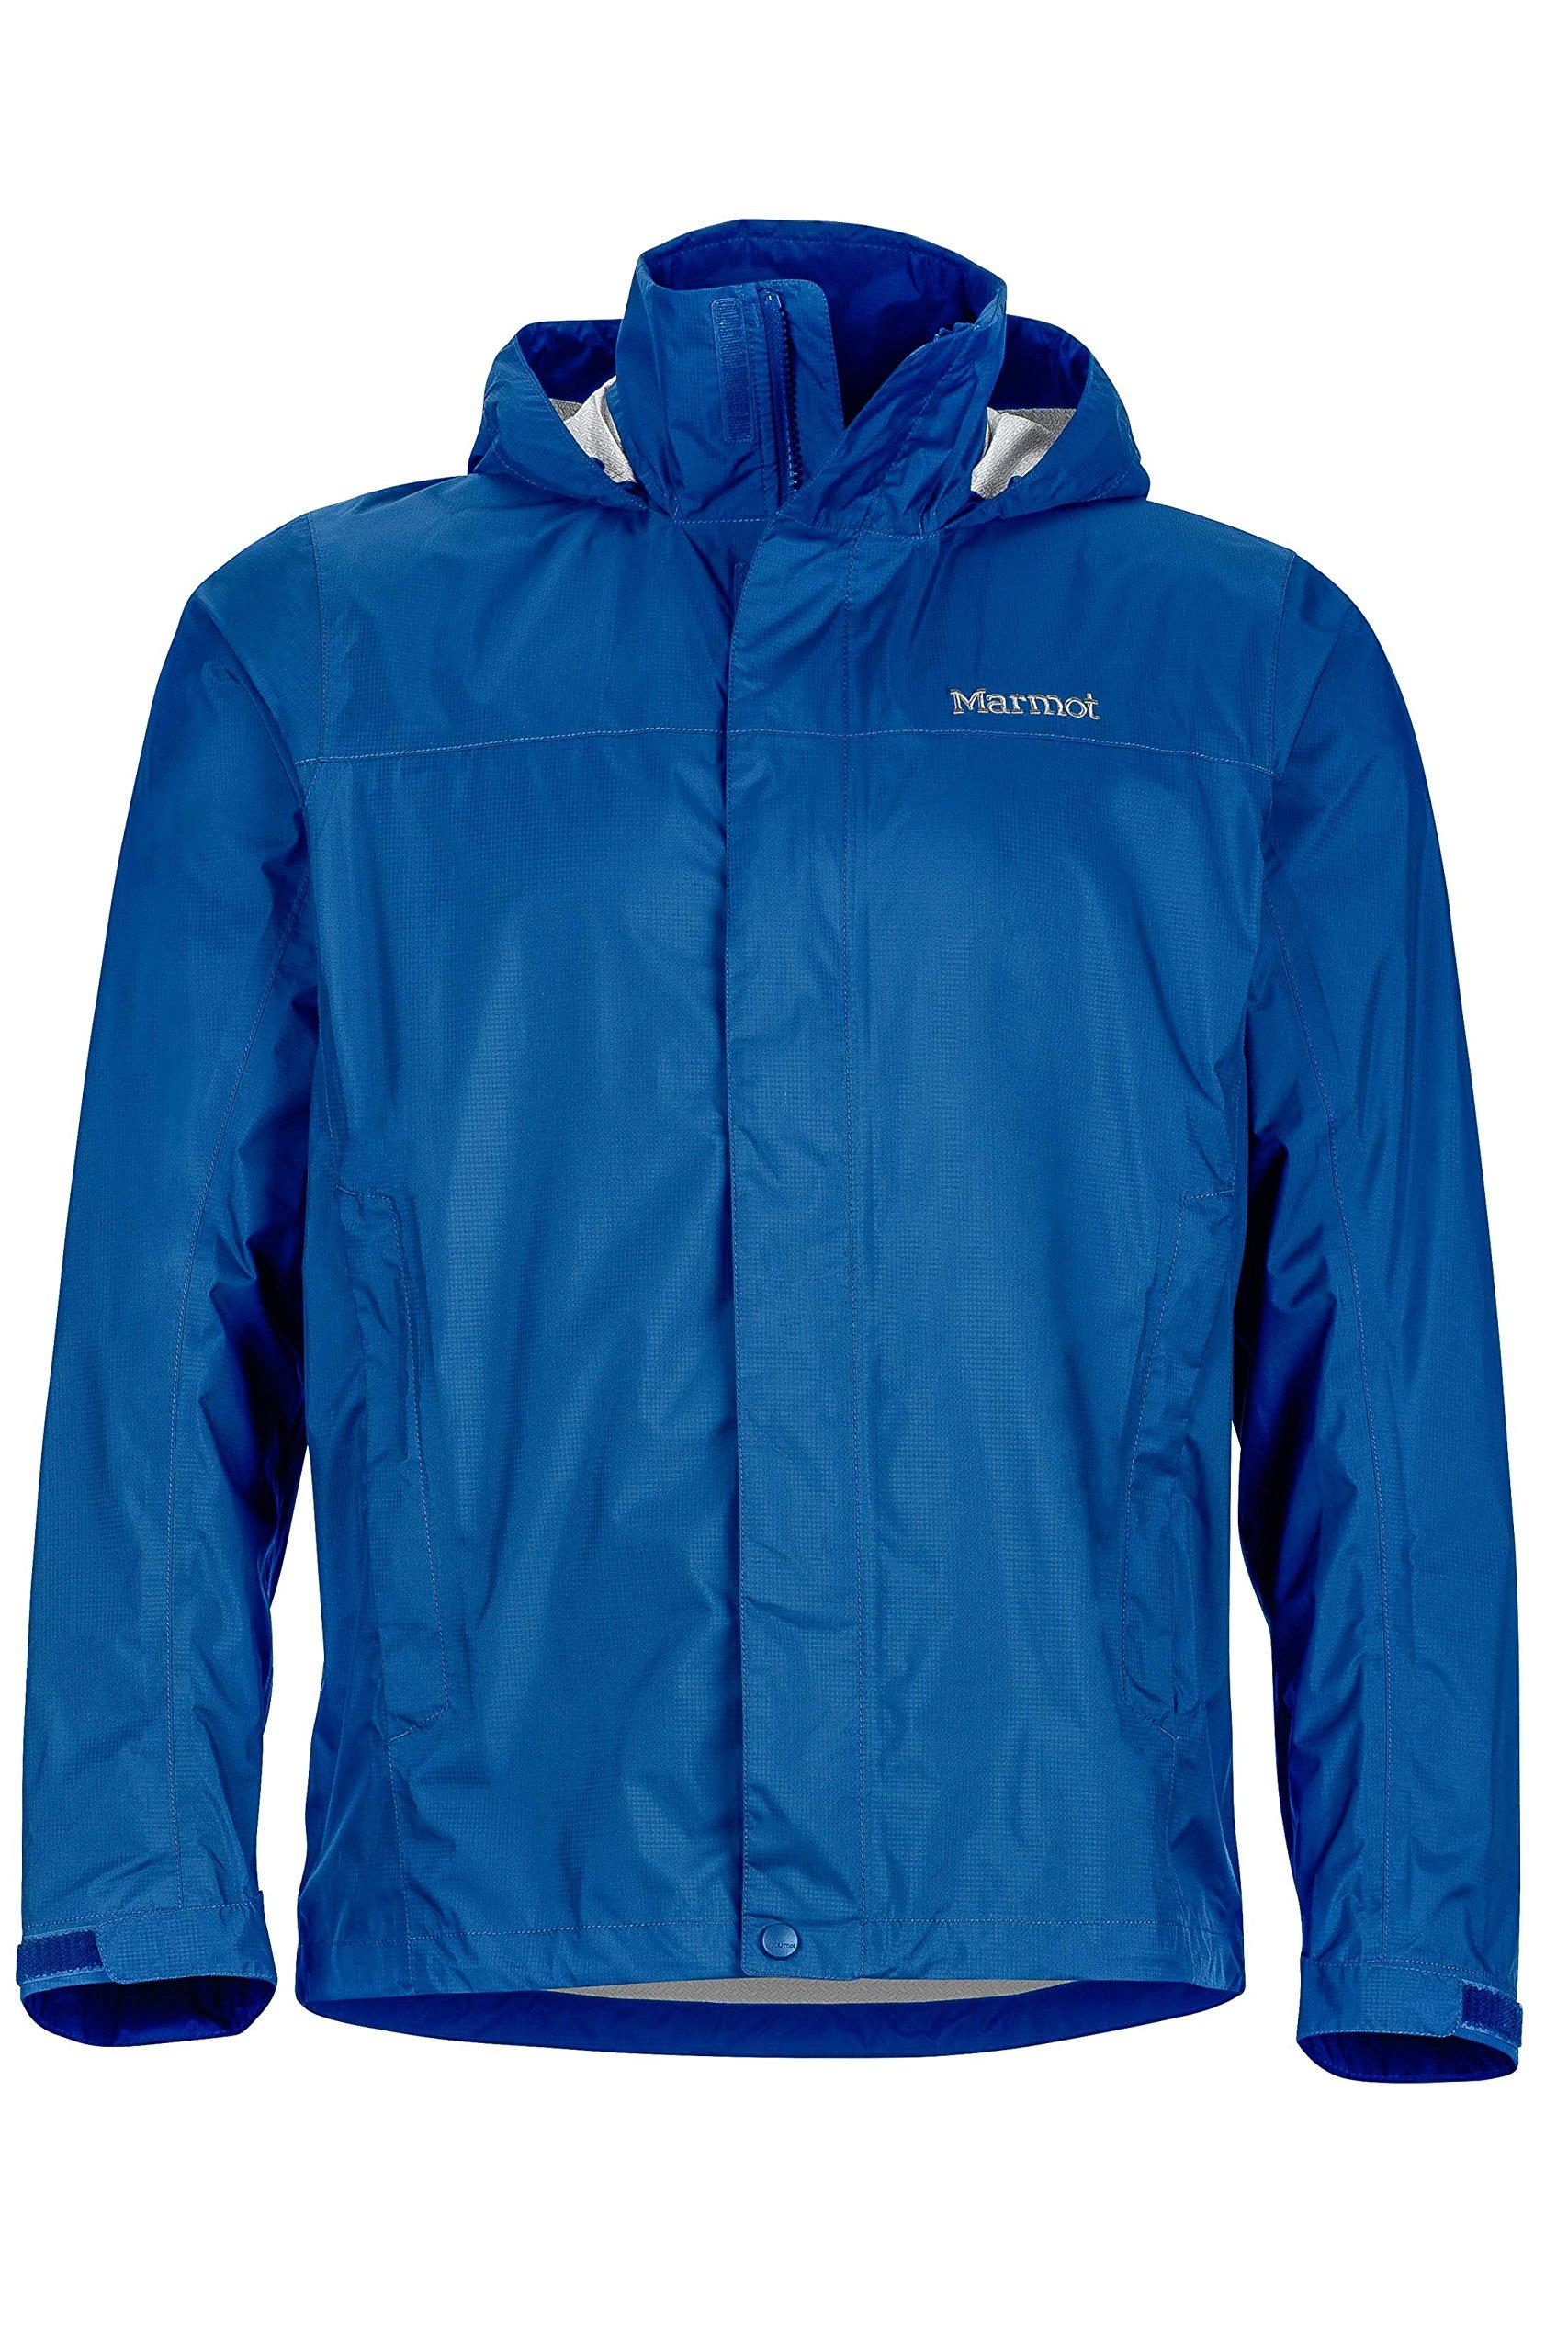 Marmot PreCip Men's Lightweight Waterproof Rain Jacket